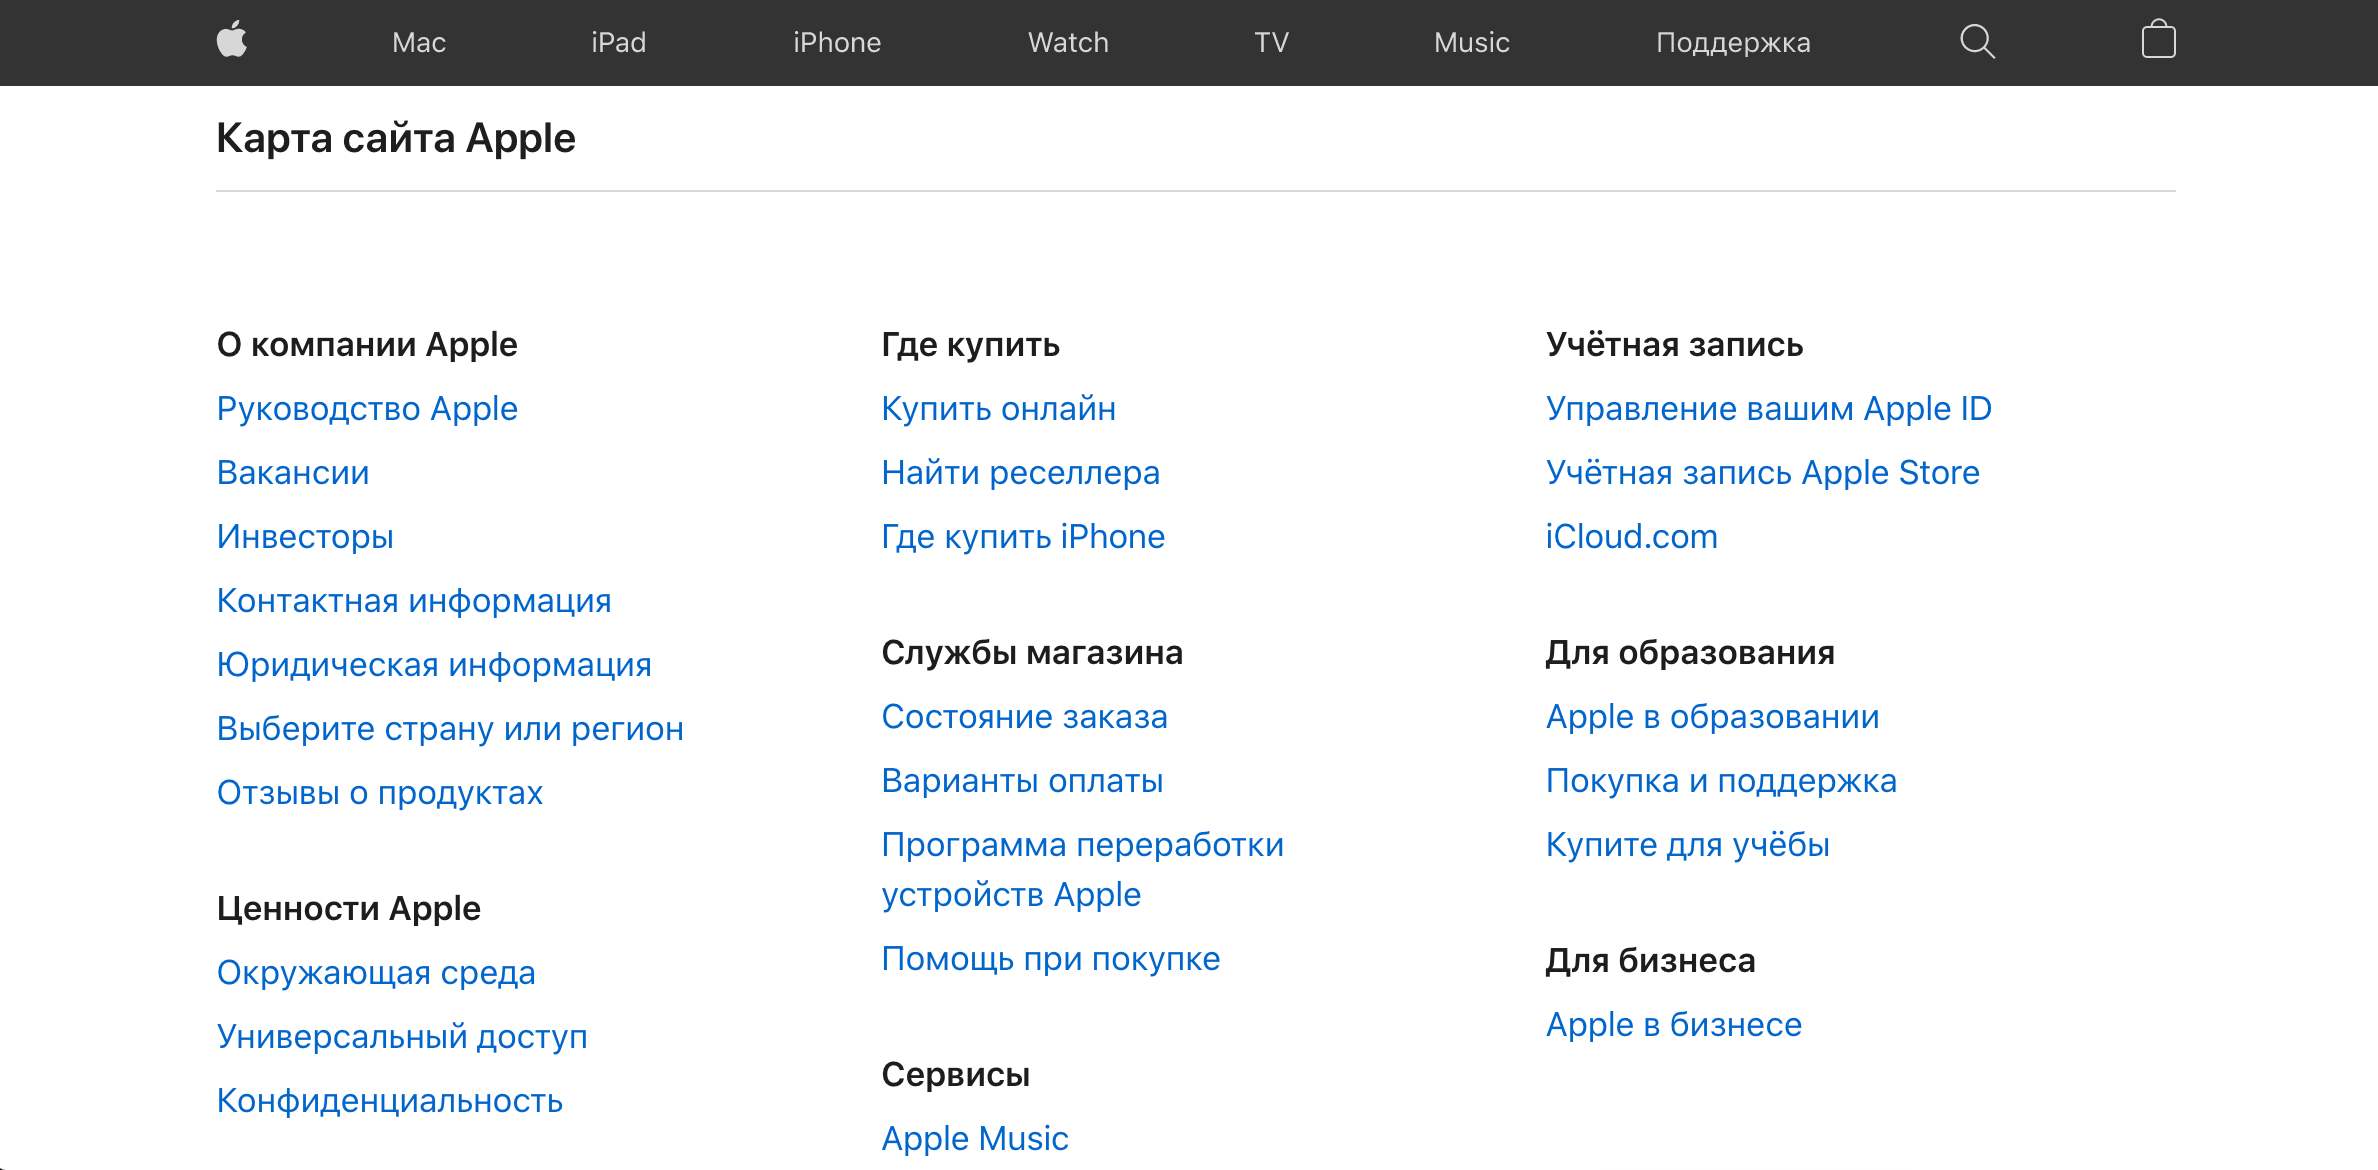 Карта сайта Apple